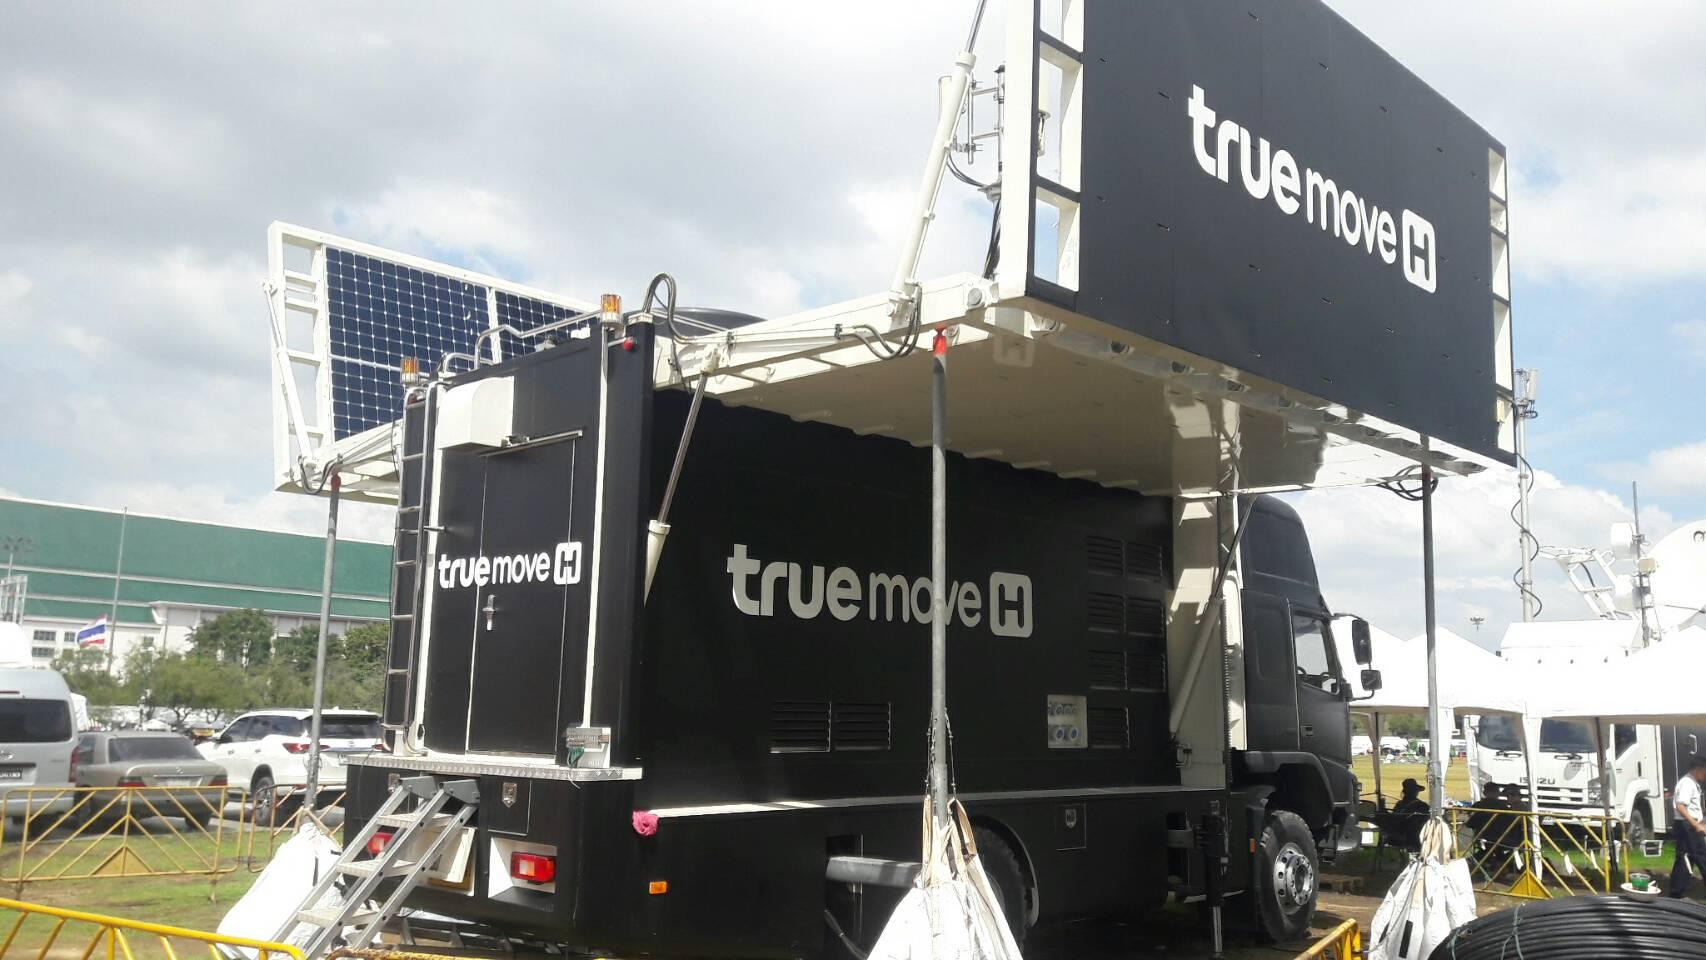 truemove-mobile-expand